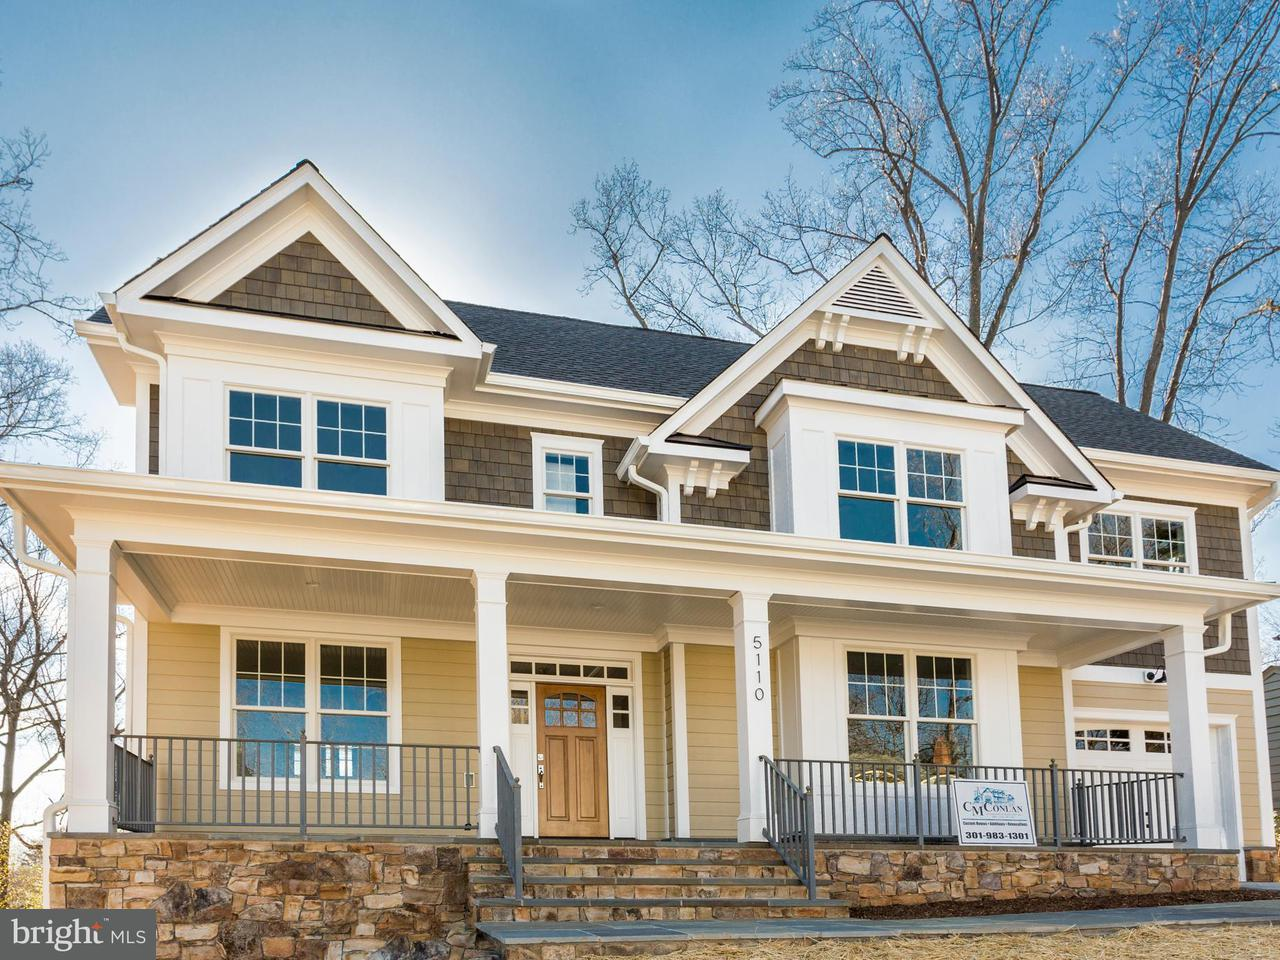 Single Family Home for Sale at 5110 Elsmere Avenue 5110 Elsmere Avenue Bethesda, Maryland 20814 United States